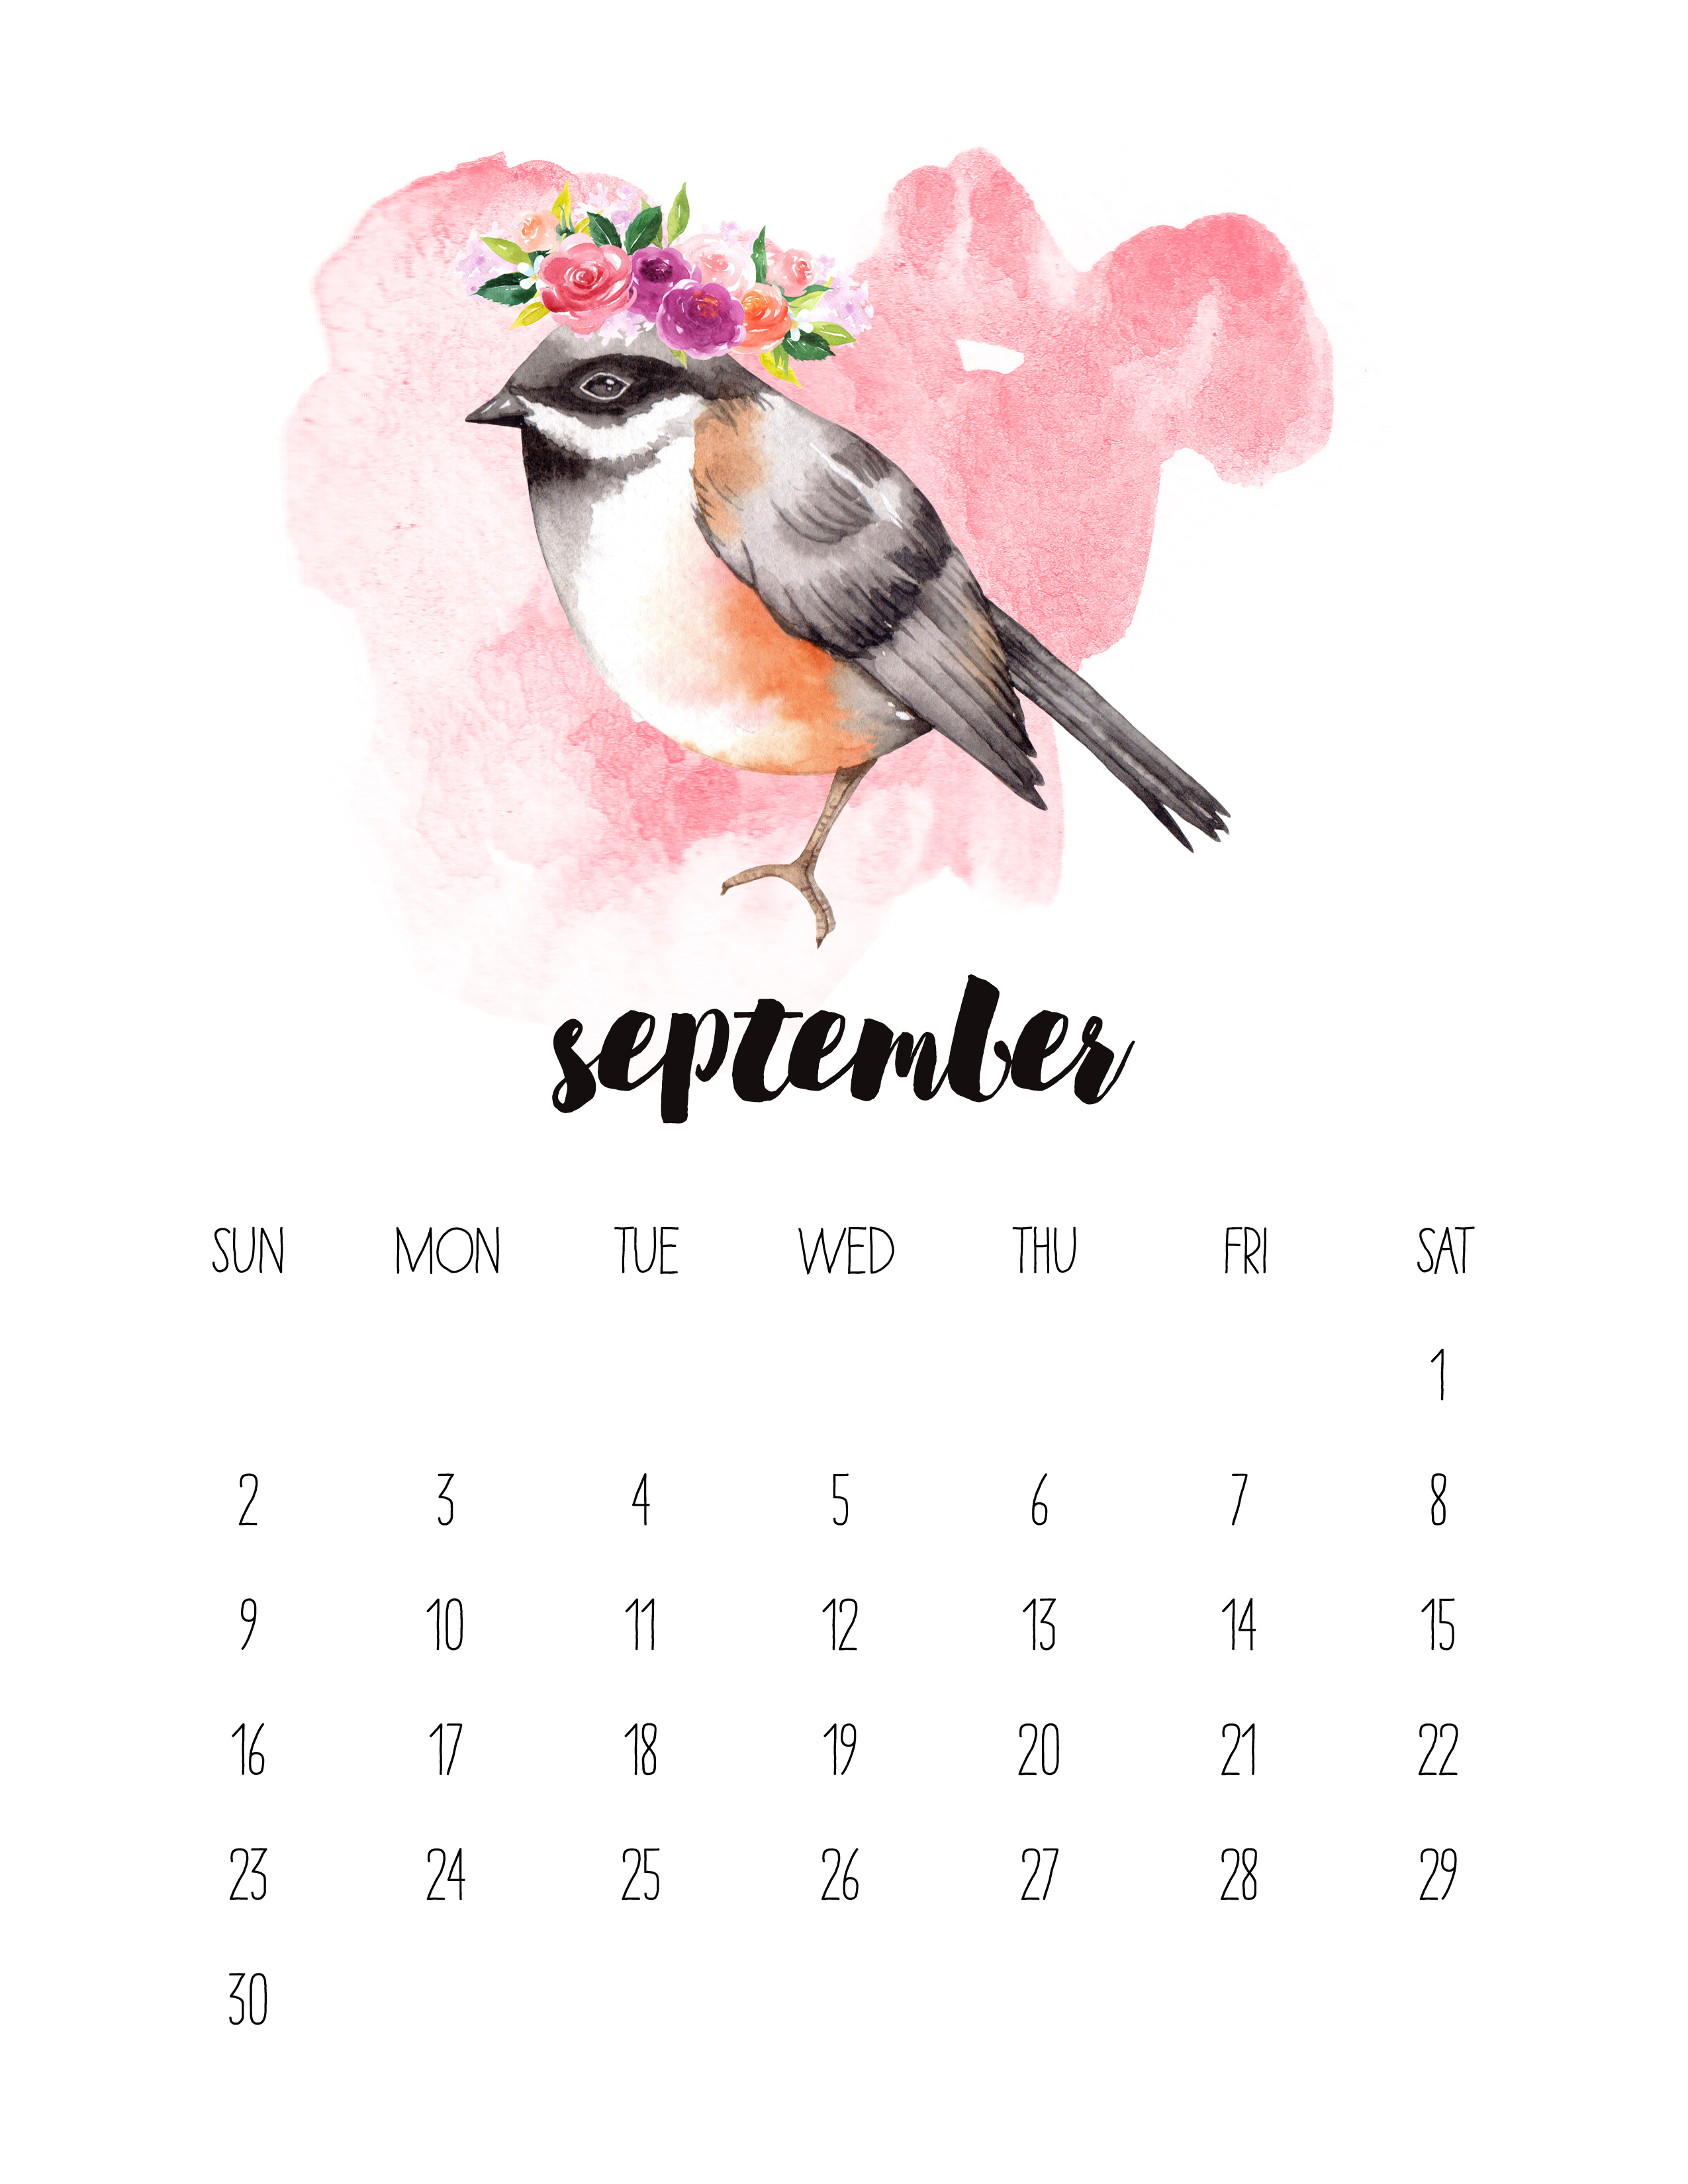 September Calendar 2018 Printable : Free printable watercolor animal calendar the